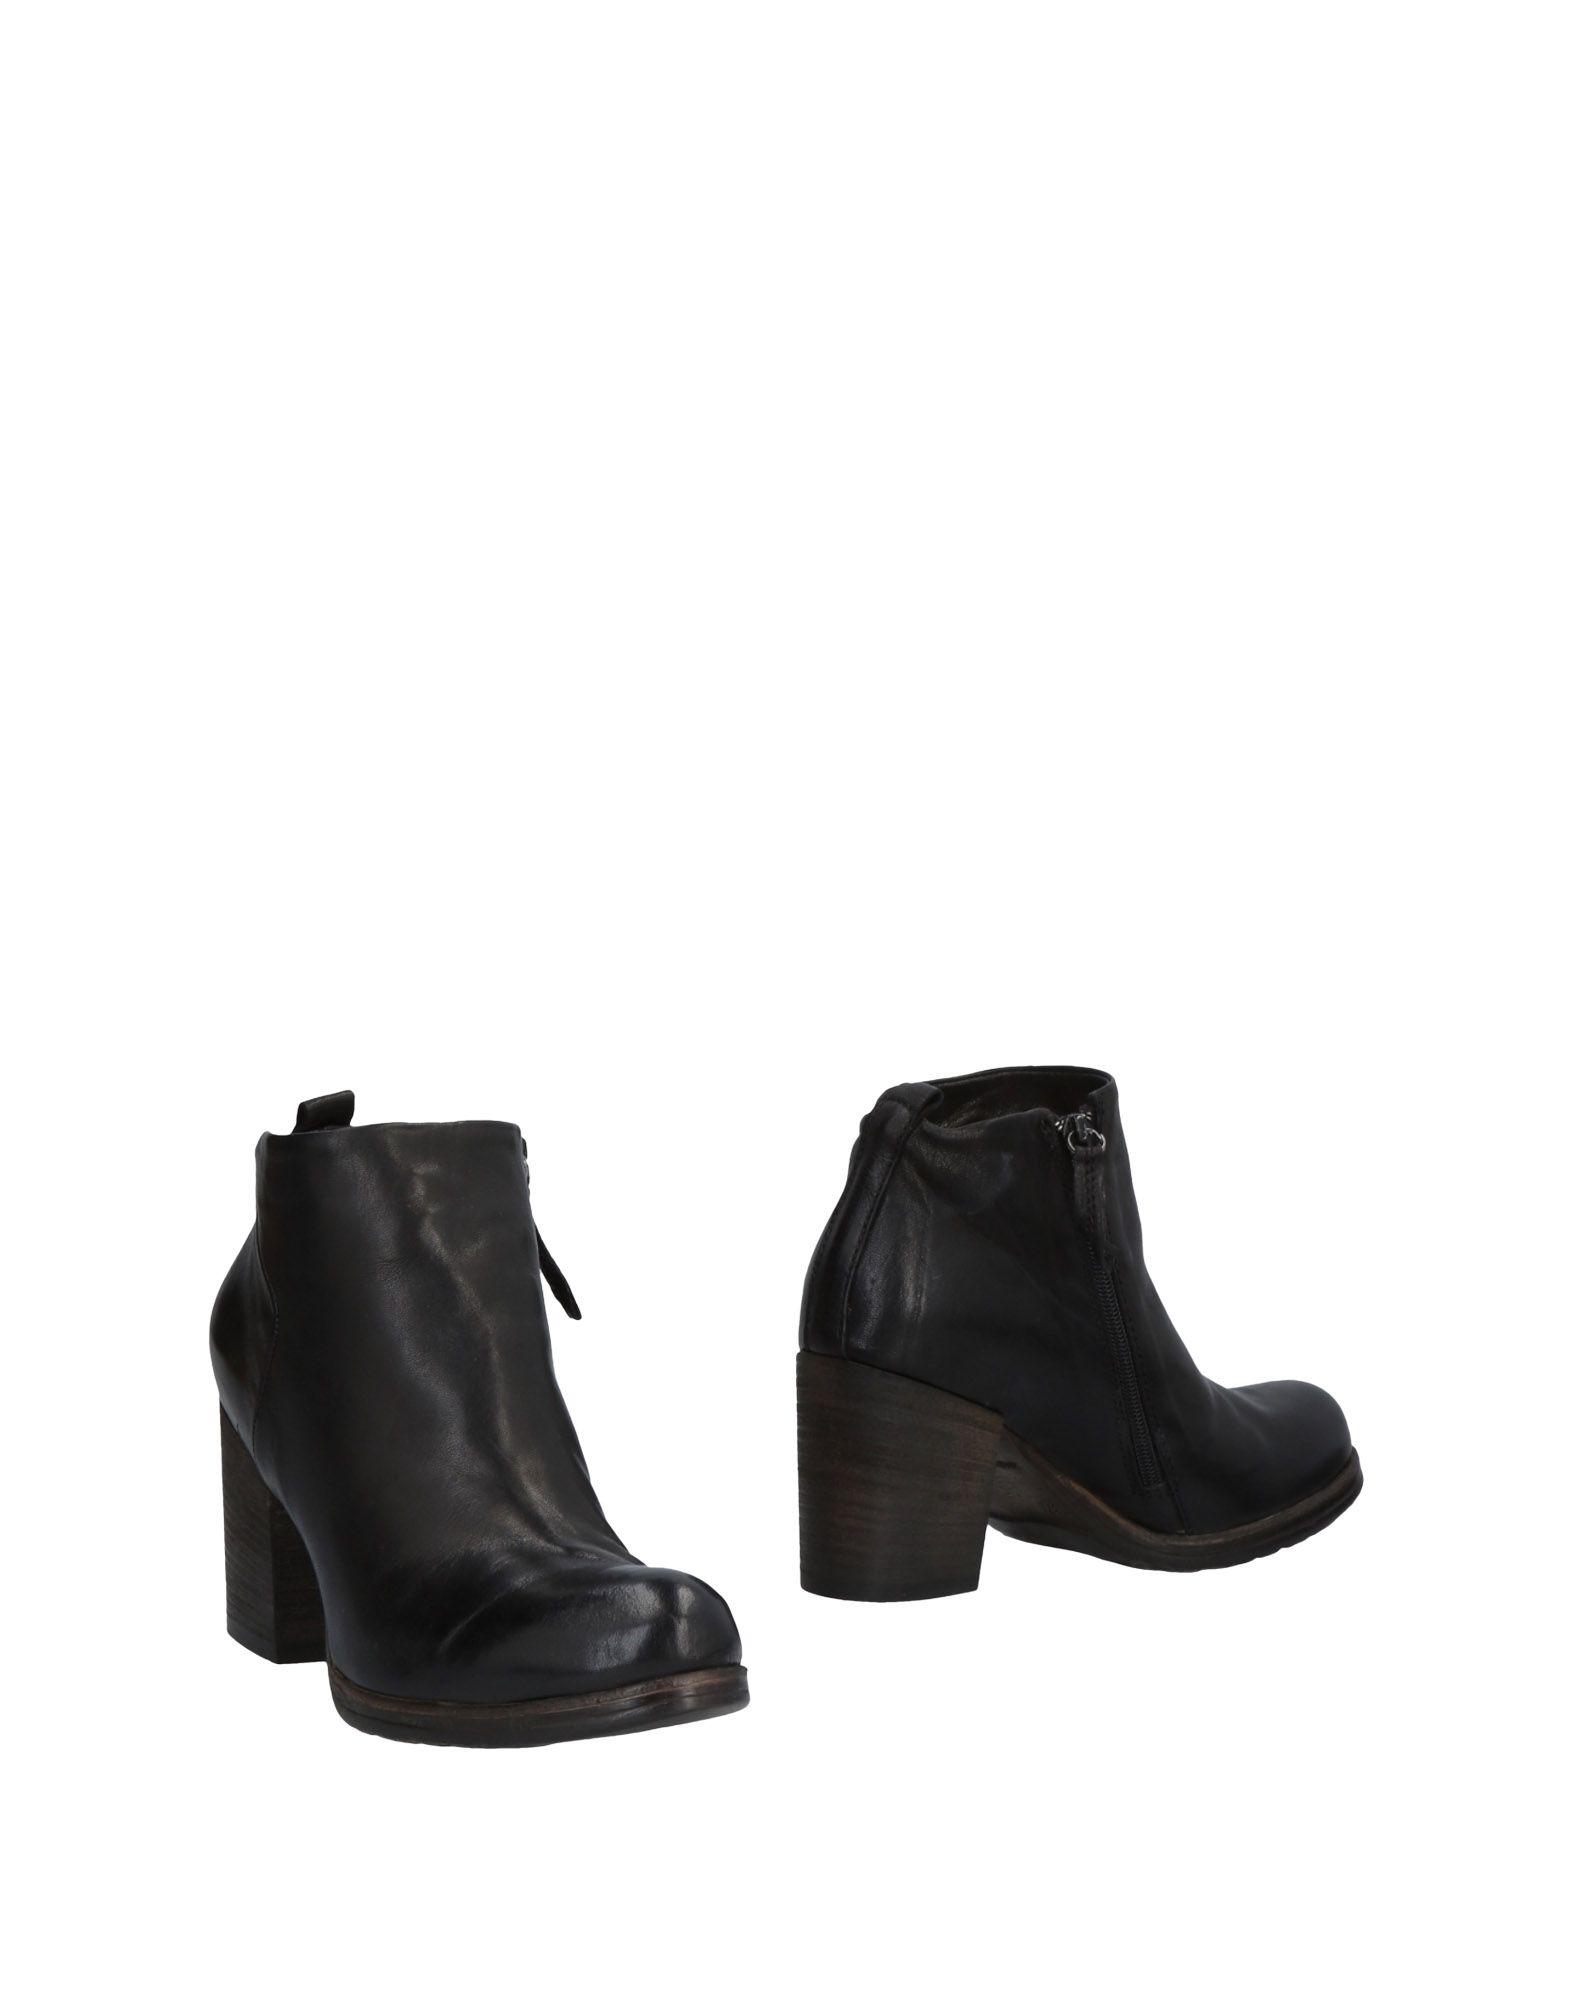 Stilvolle billige Schuhe Damen Studio By Volpato Stiefelette Damen Schuhe  11486908HT eebaf4